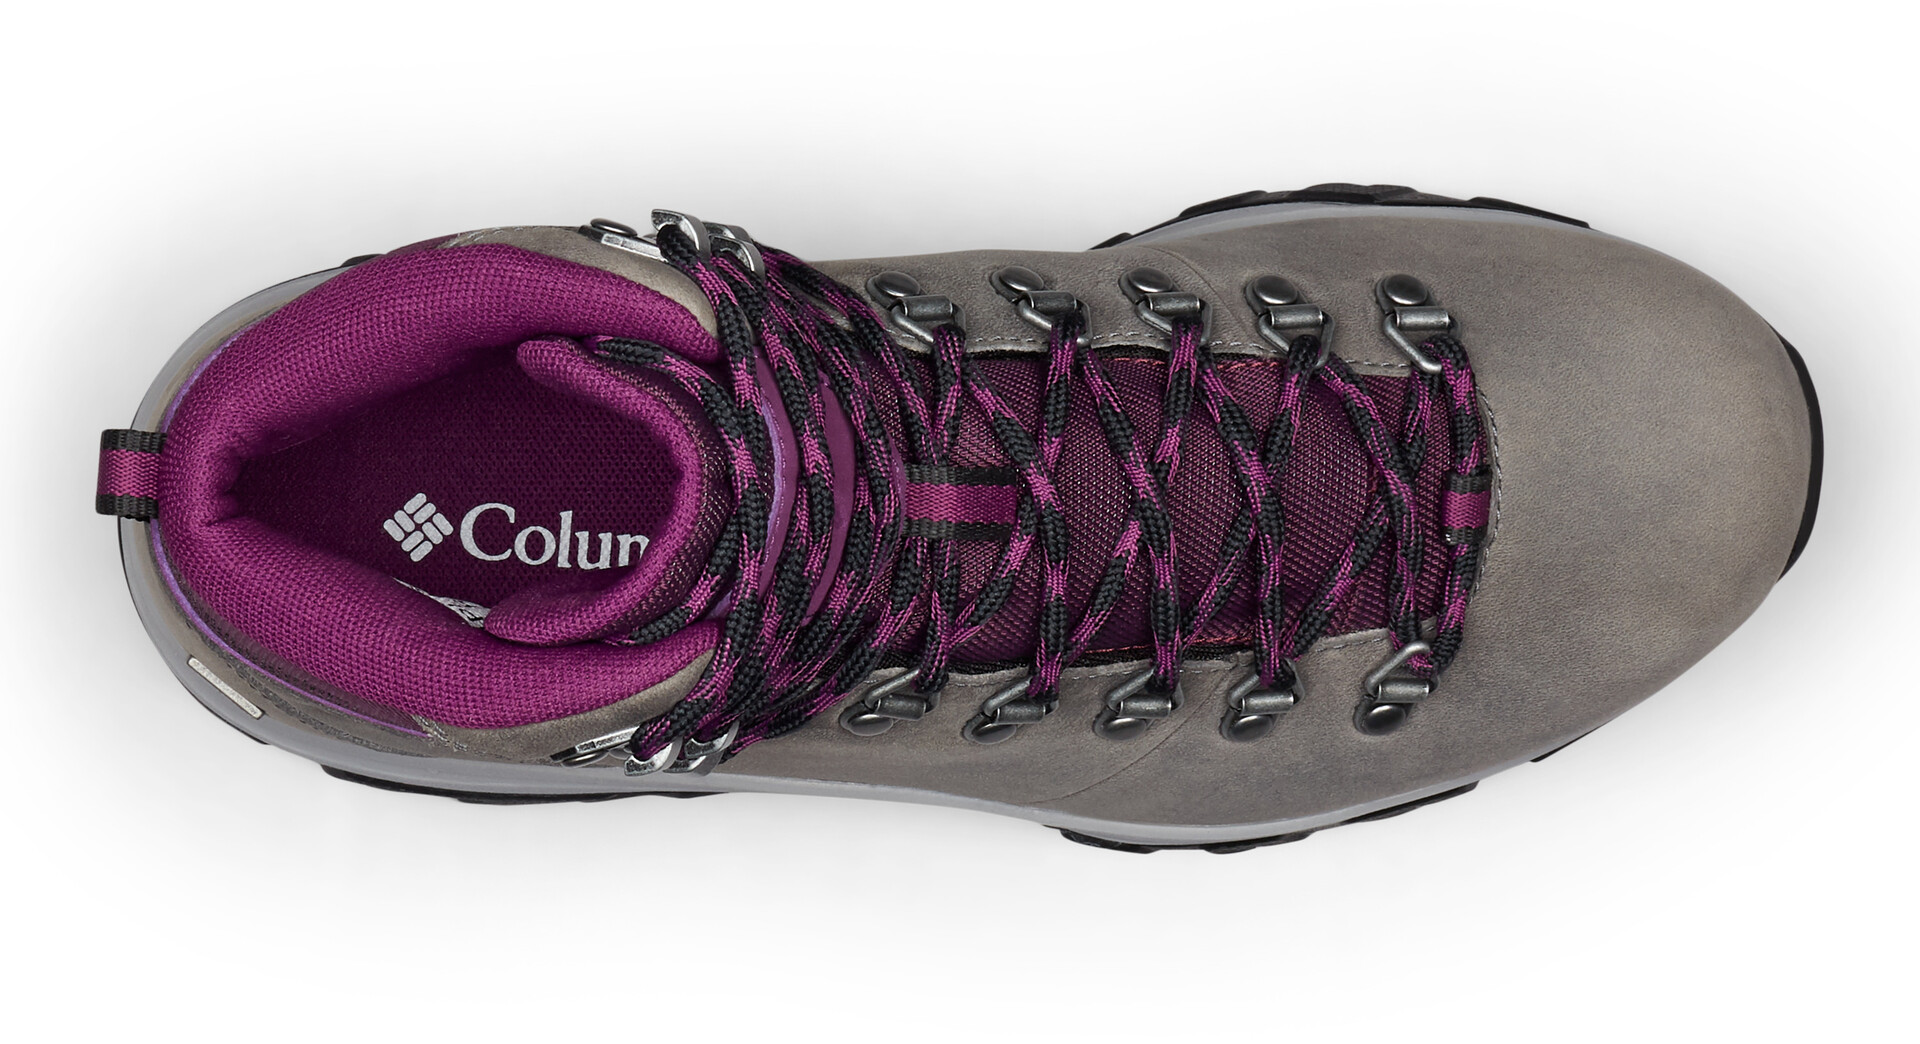 100MW Chaussures steelblack Outdry grey Titanium Femmeti cherry Columbia clJT1FK